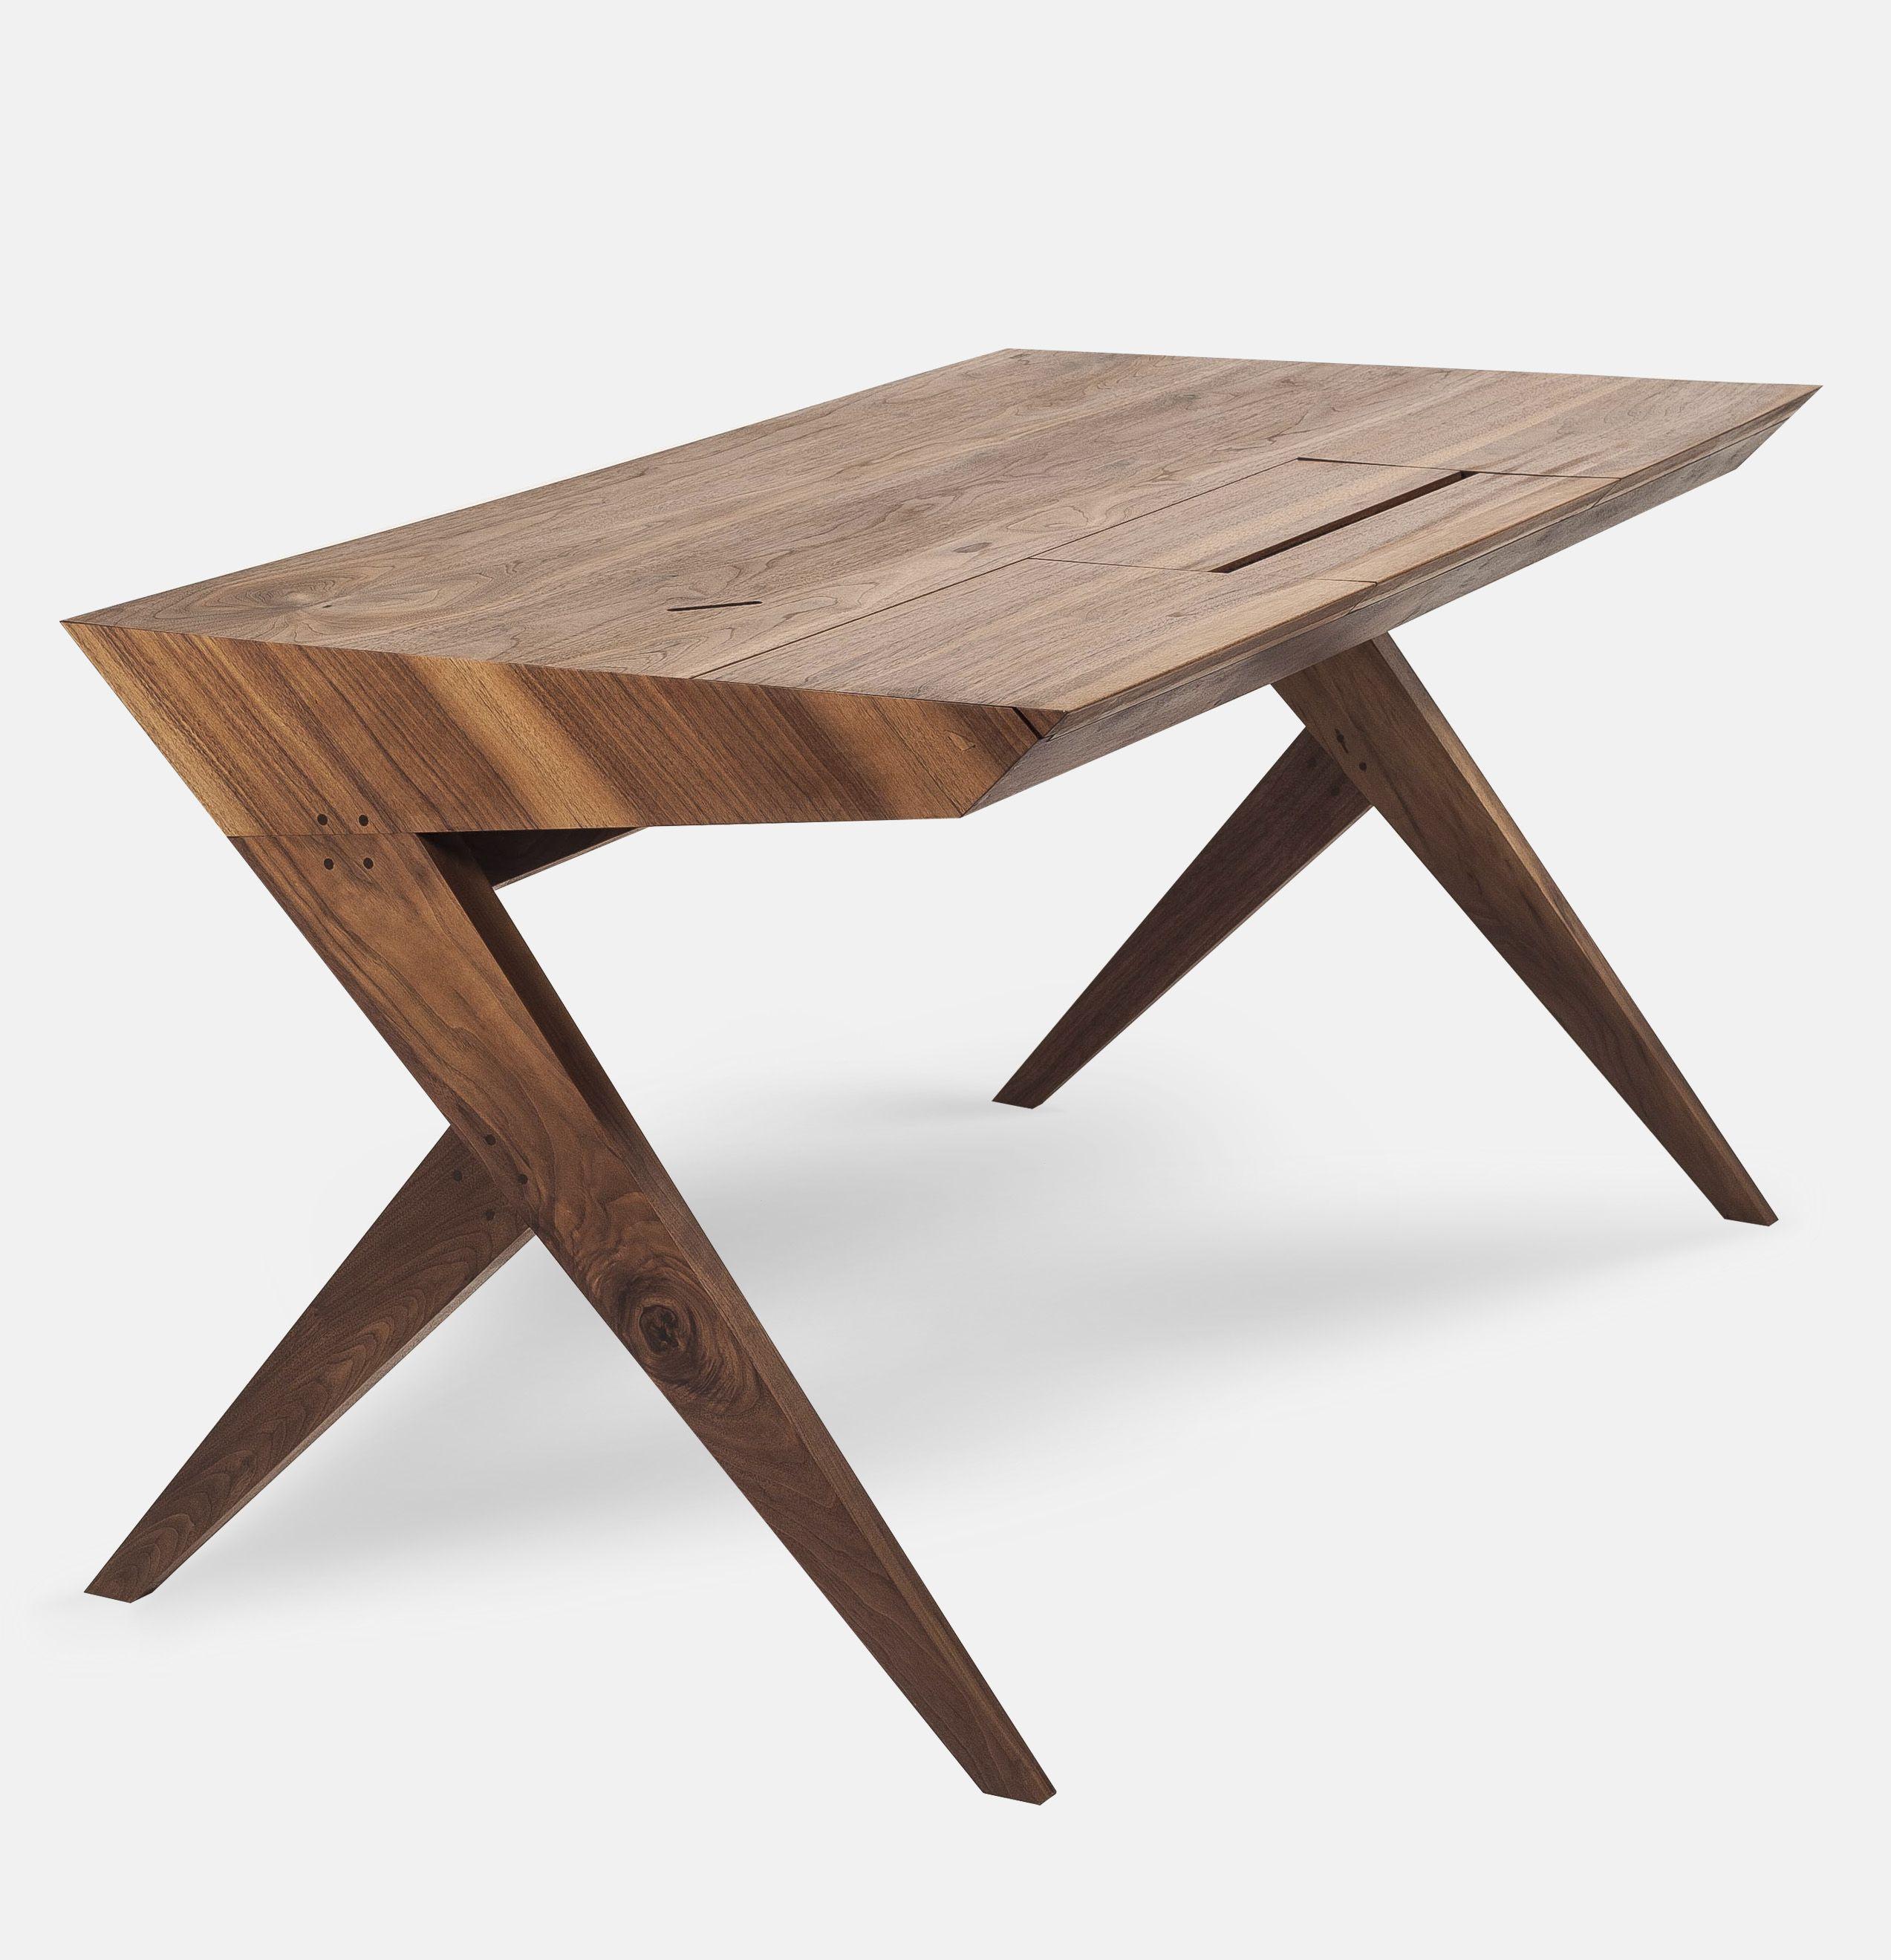 LOCUST DESK by AROUNDtheTREE  (Alexandre Caldas ) ORDER NOW #aroundthetreedesign #workingdesk #desks #design #interiors #interiordesign #locustworkingdesk